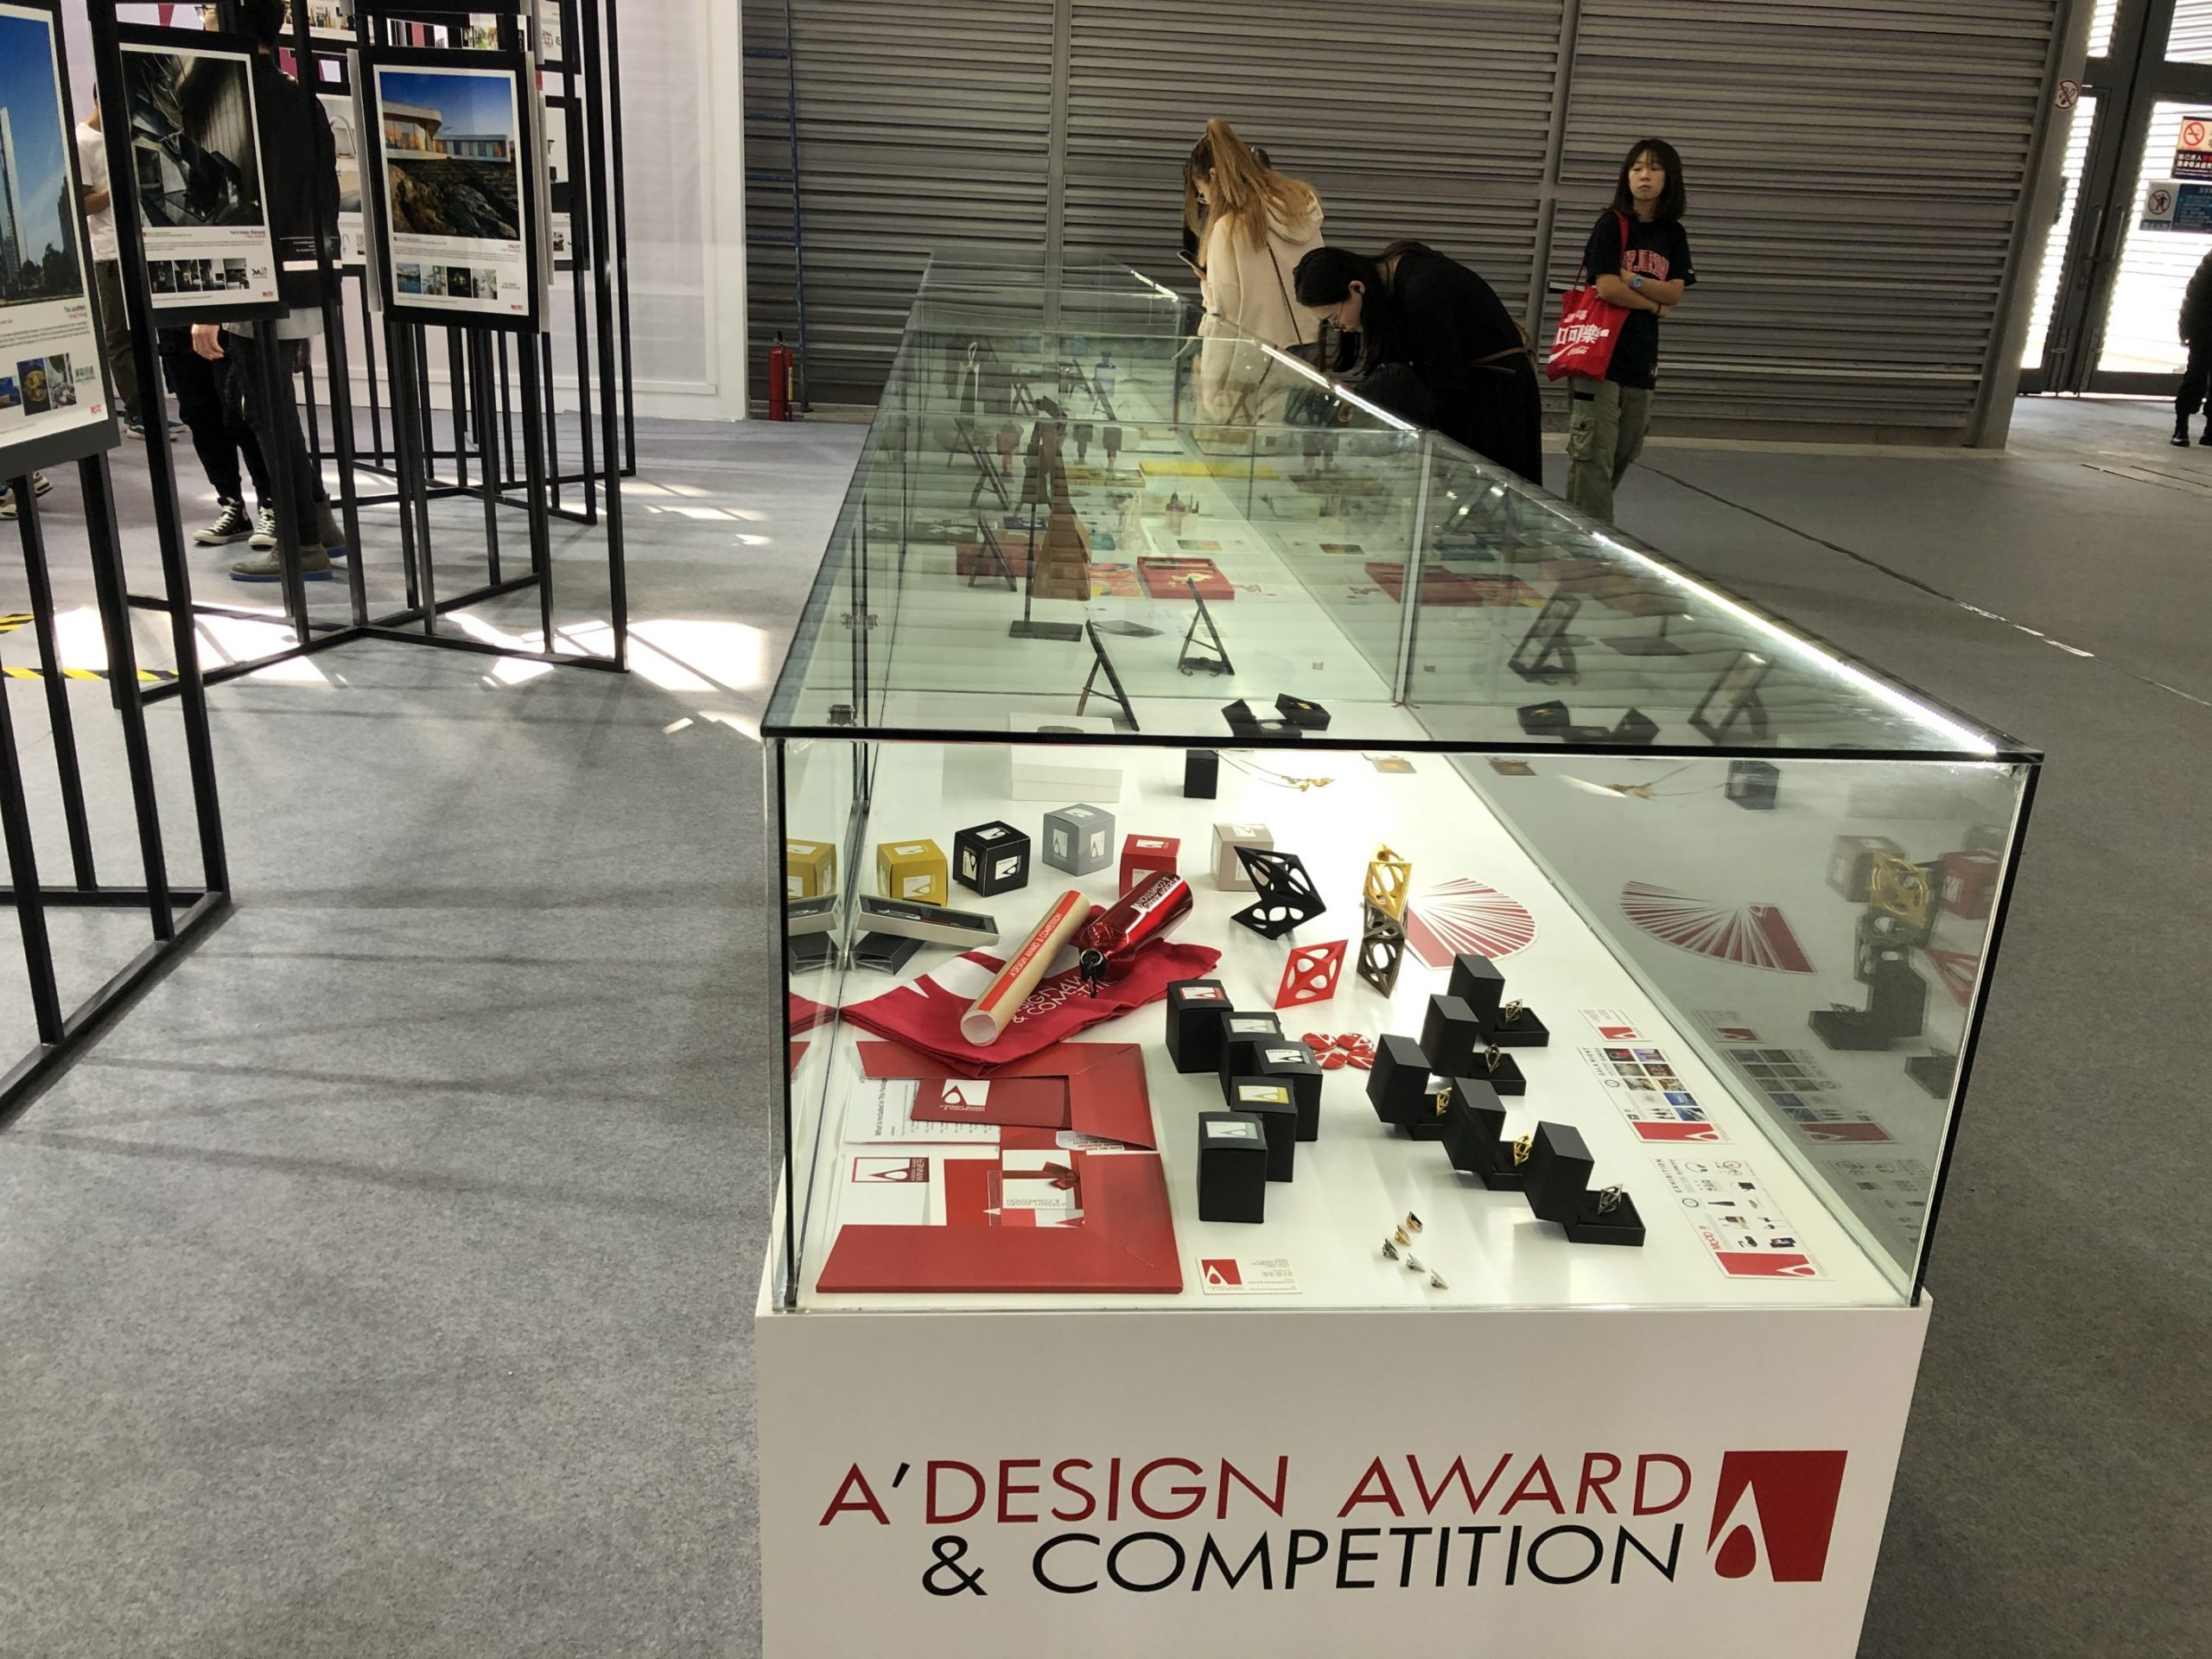 ¡No te quedes afuera! A' Design Awards cierra sus inscripciones 2